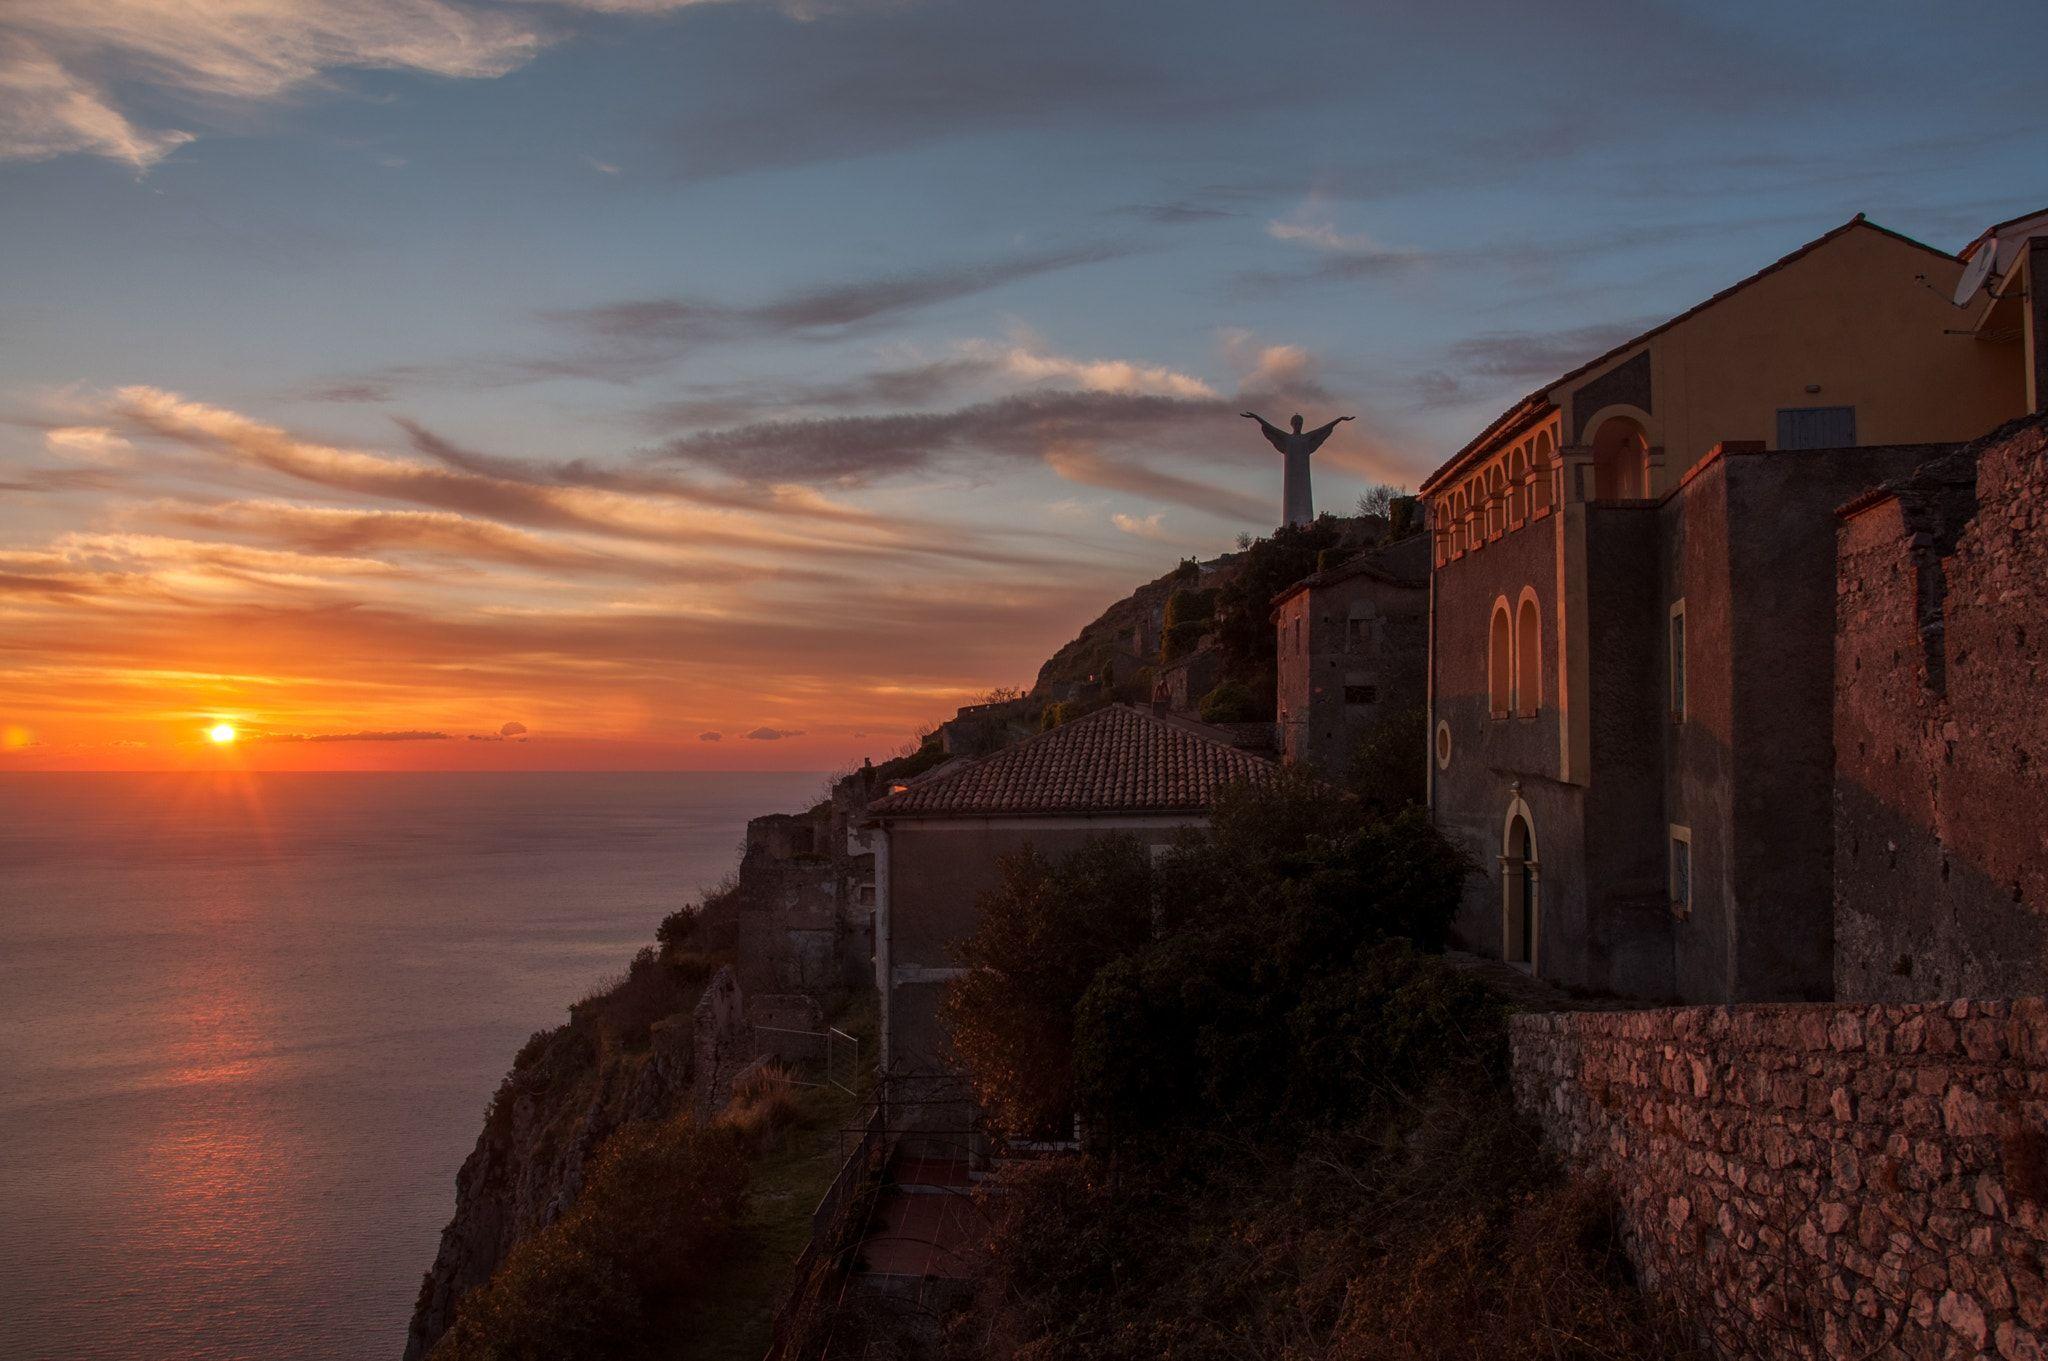 Sunset 31.12.2016 Vista dal monte San Biagio. Maratea